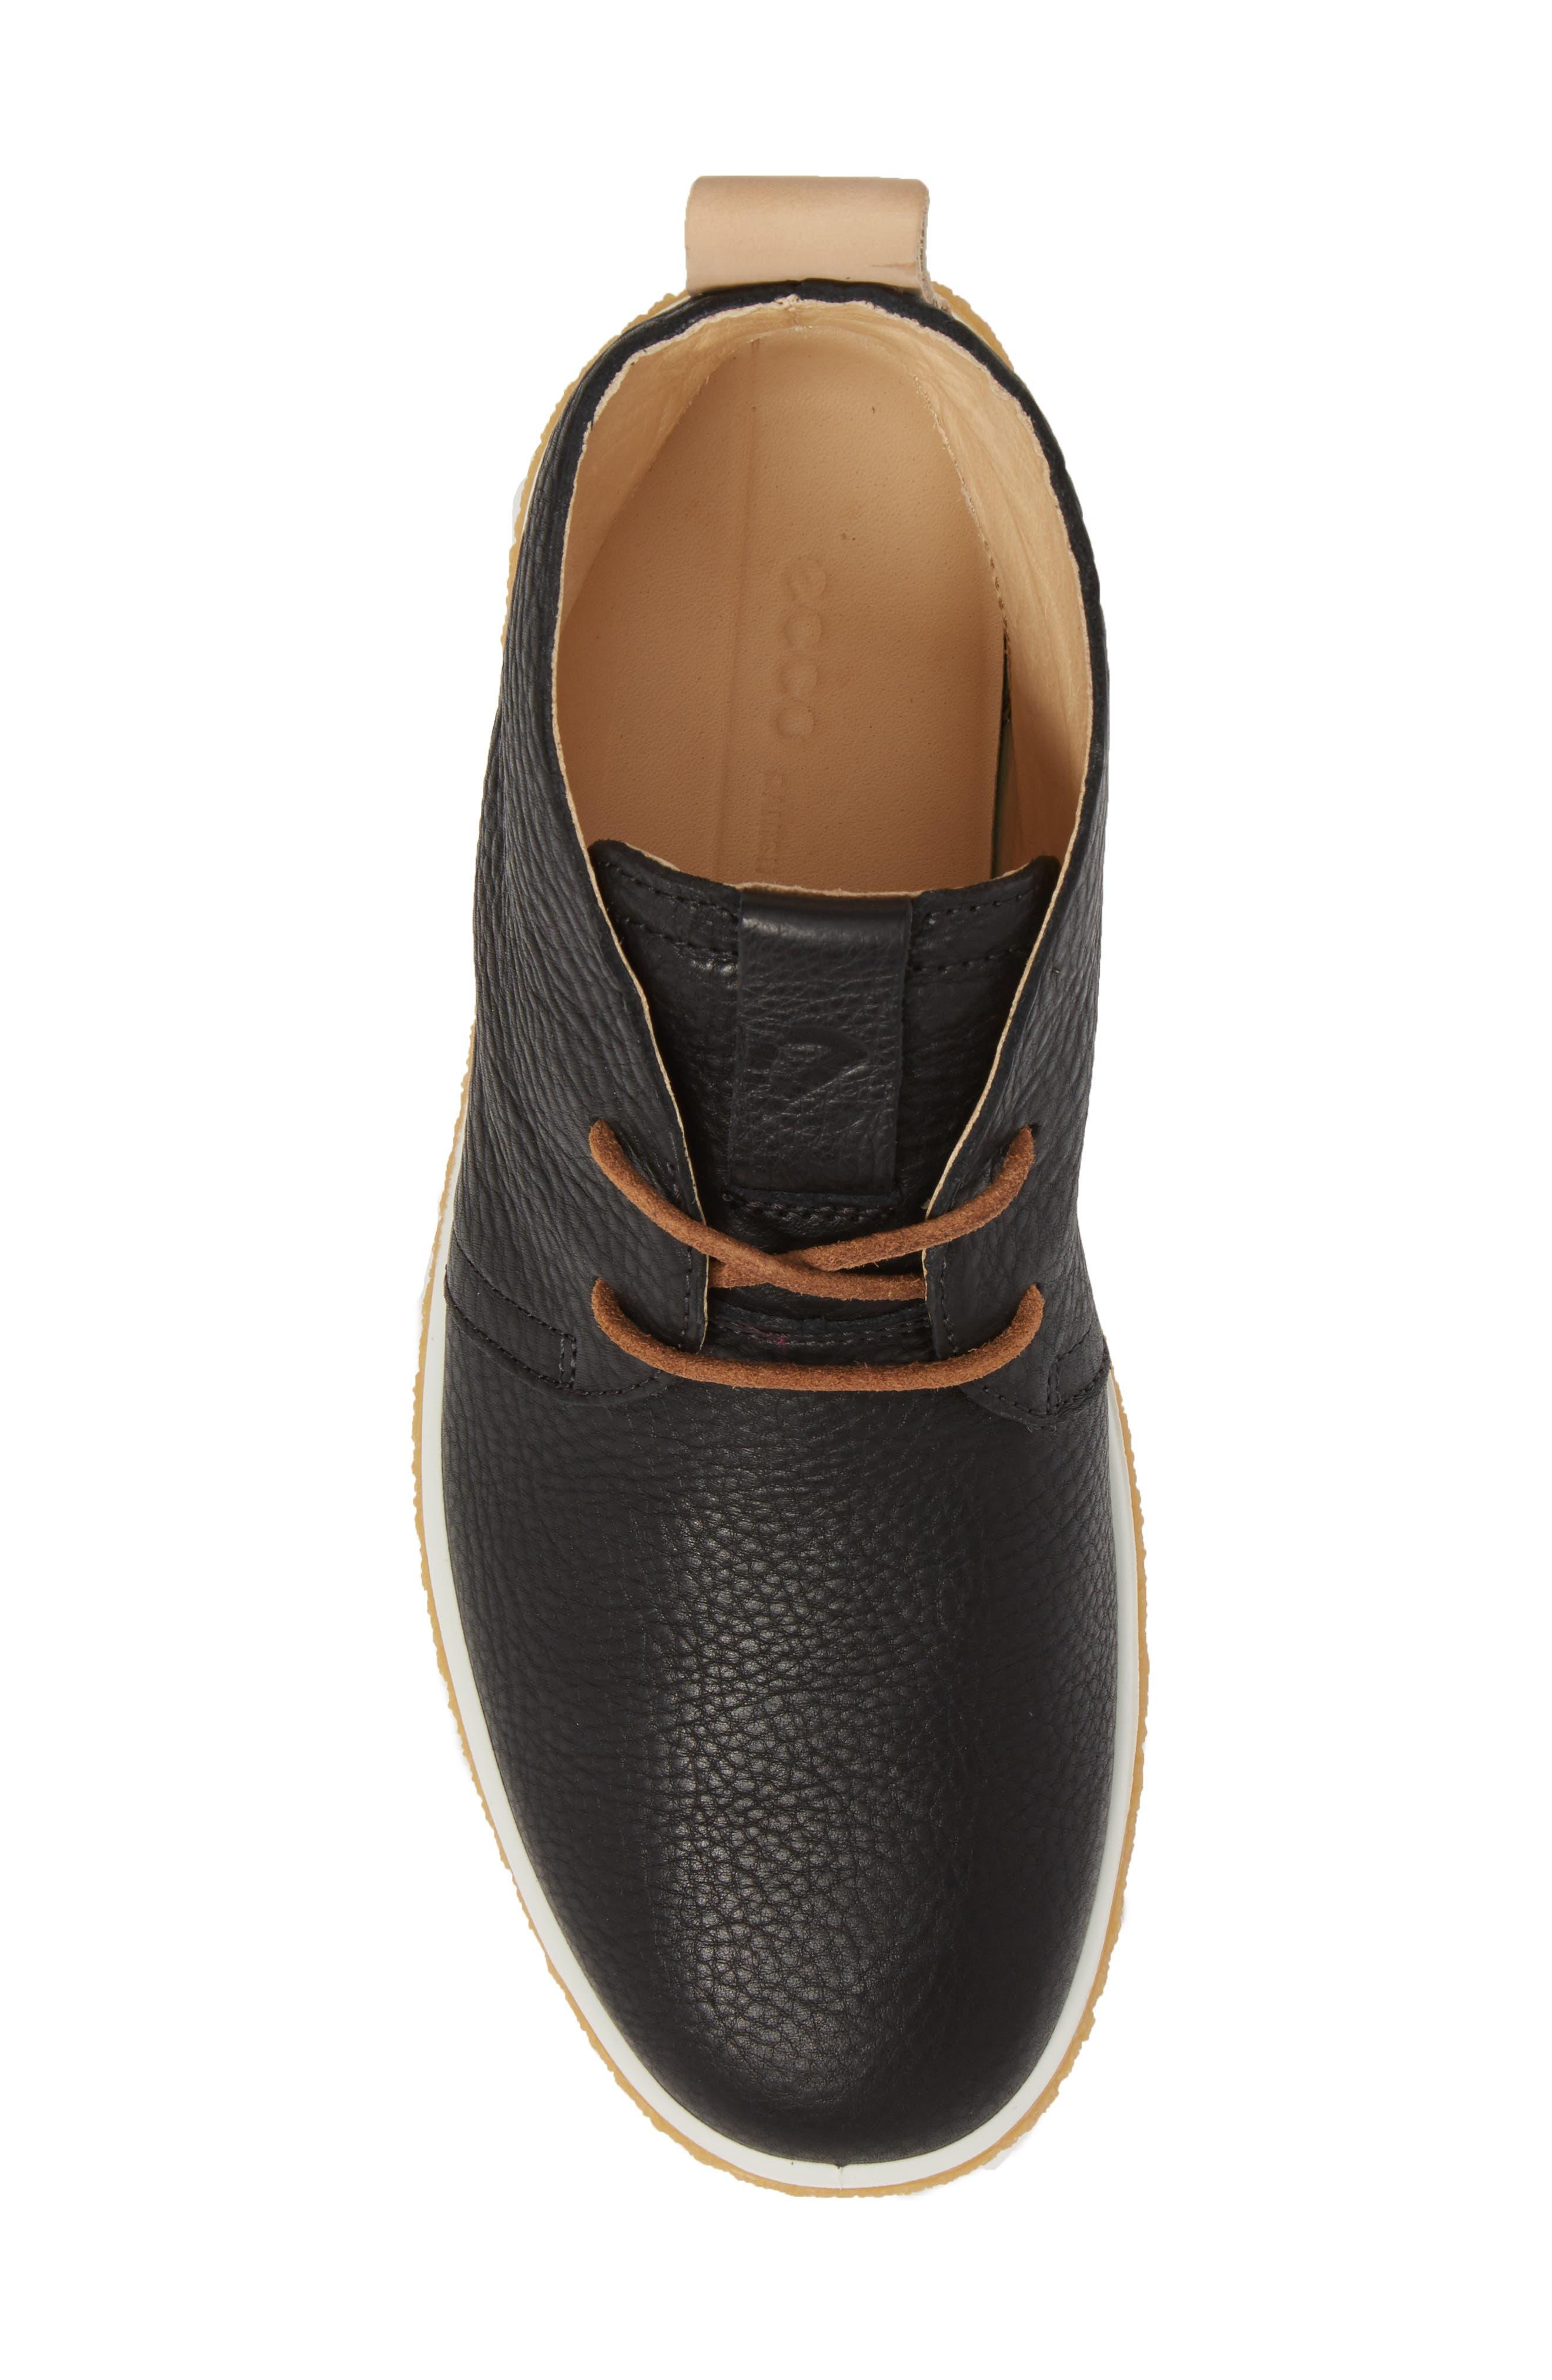 Crepetray Chukka Boot,                             Alternate thumbnail 5, color,                             Black Powder Leather